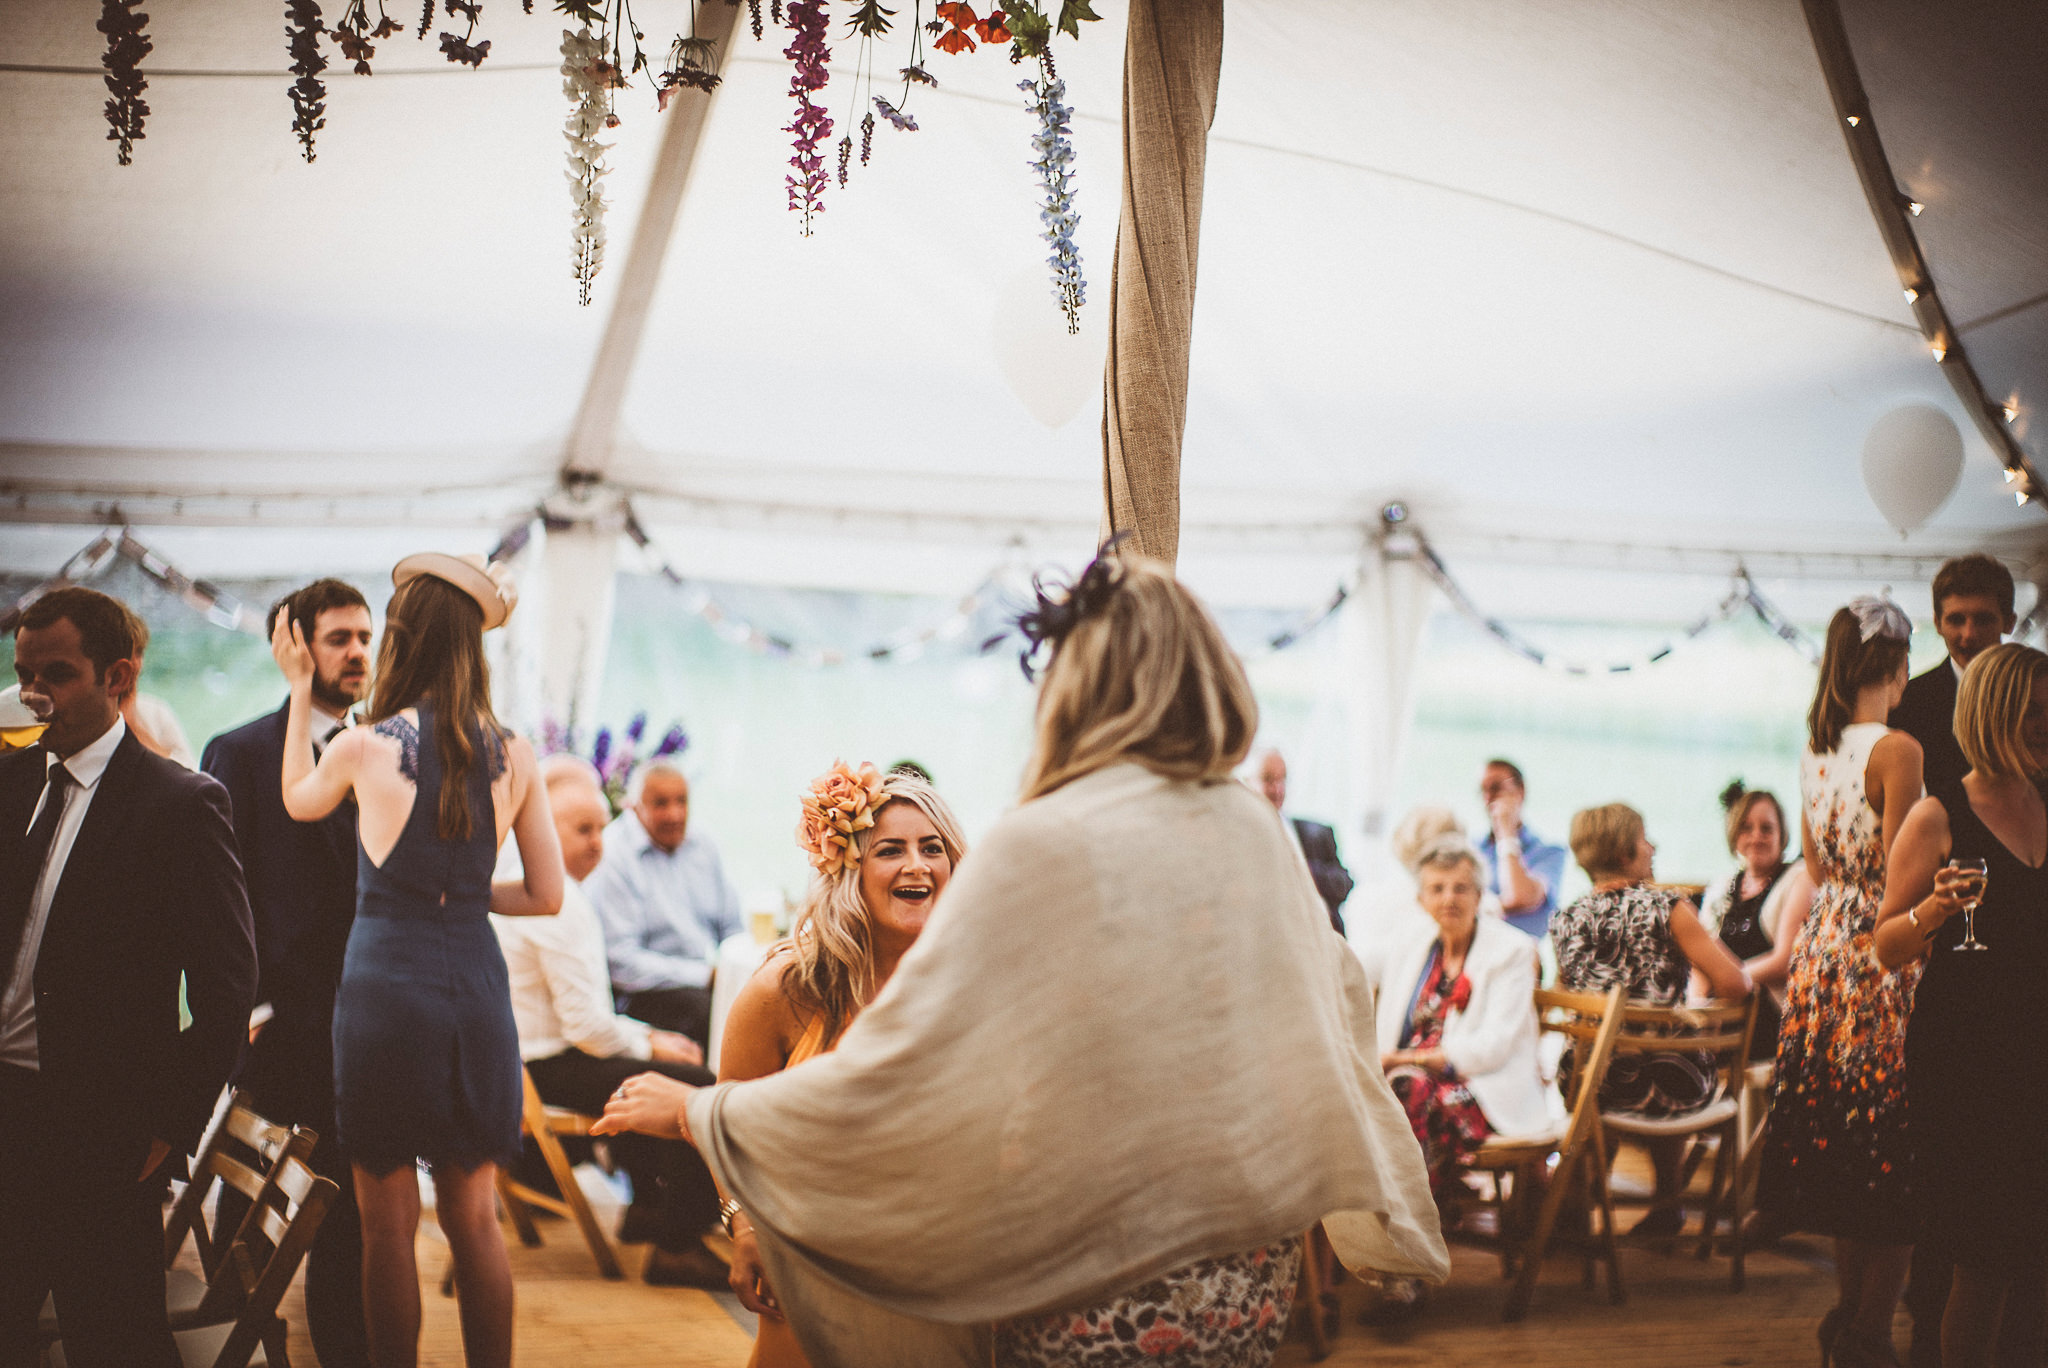 paul-marbrook-Farm-Wedding-Photographer-Lancashire-90090